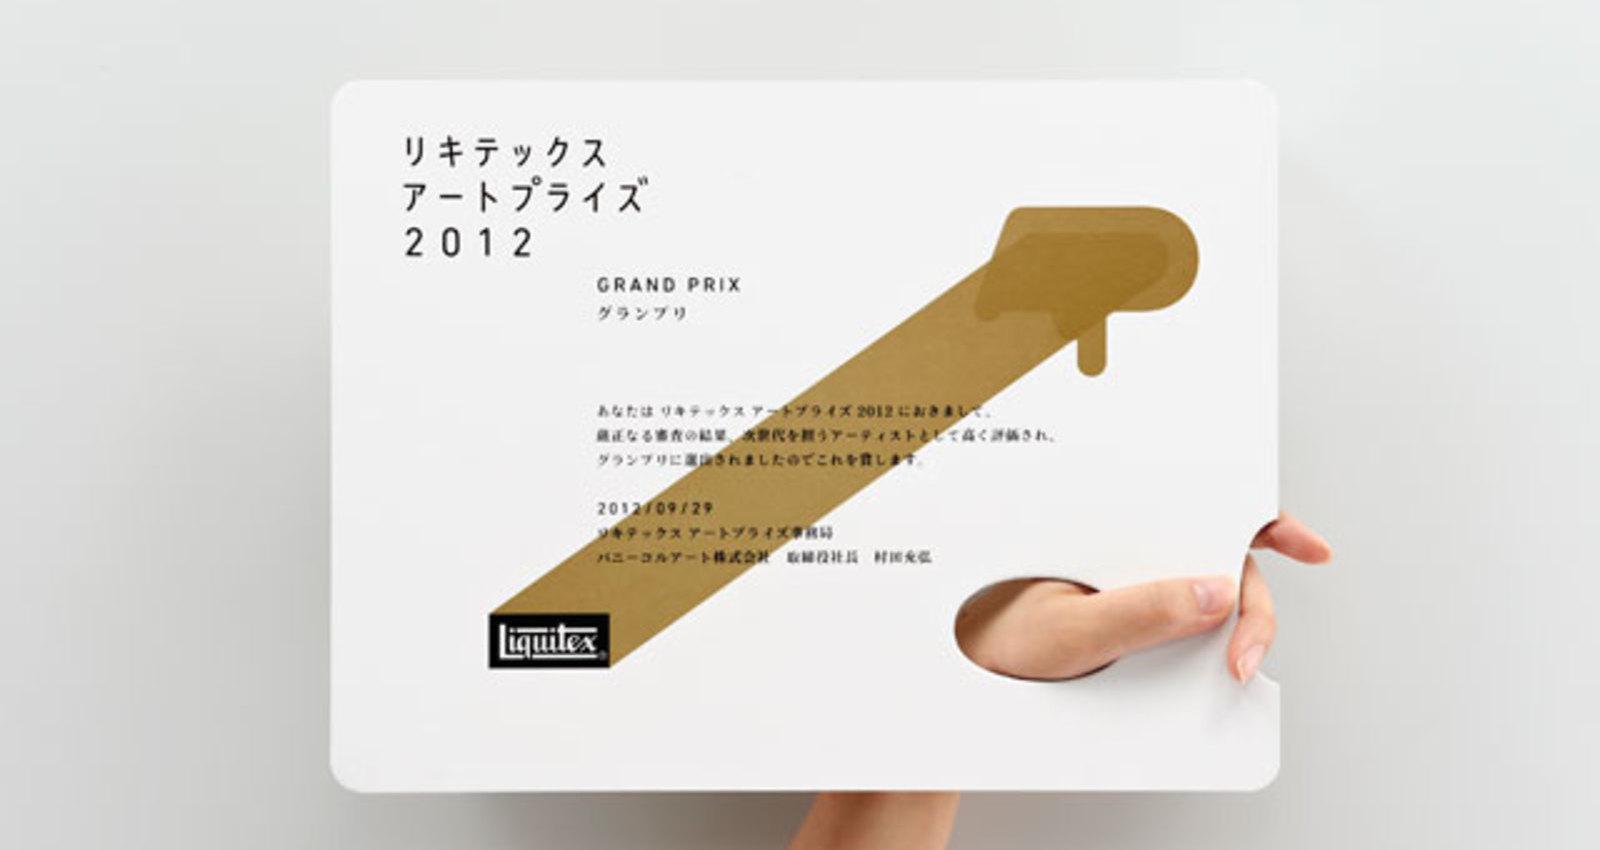 Liquitex Art Prize 2012